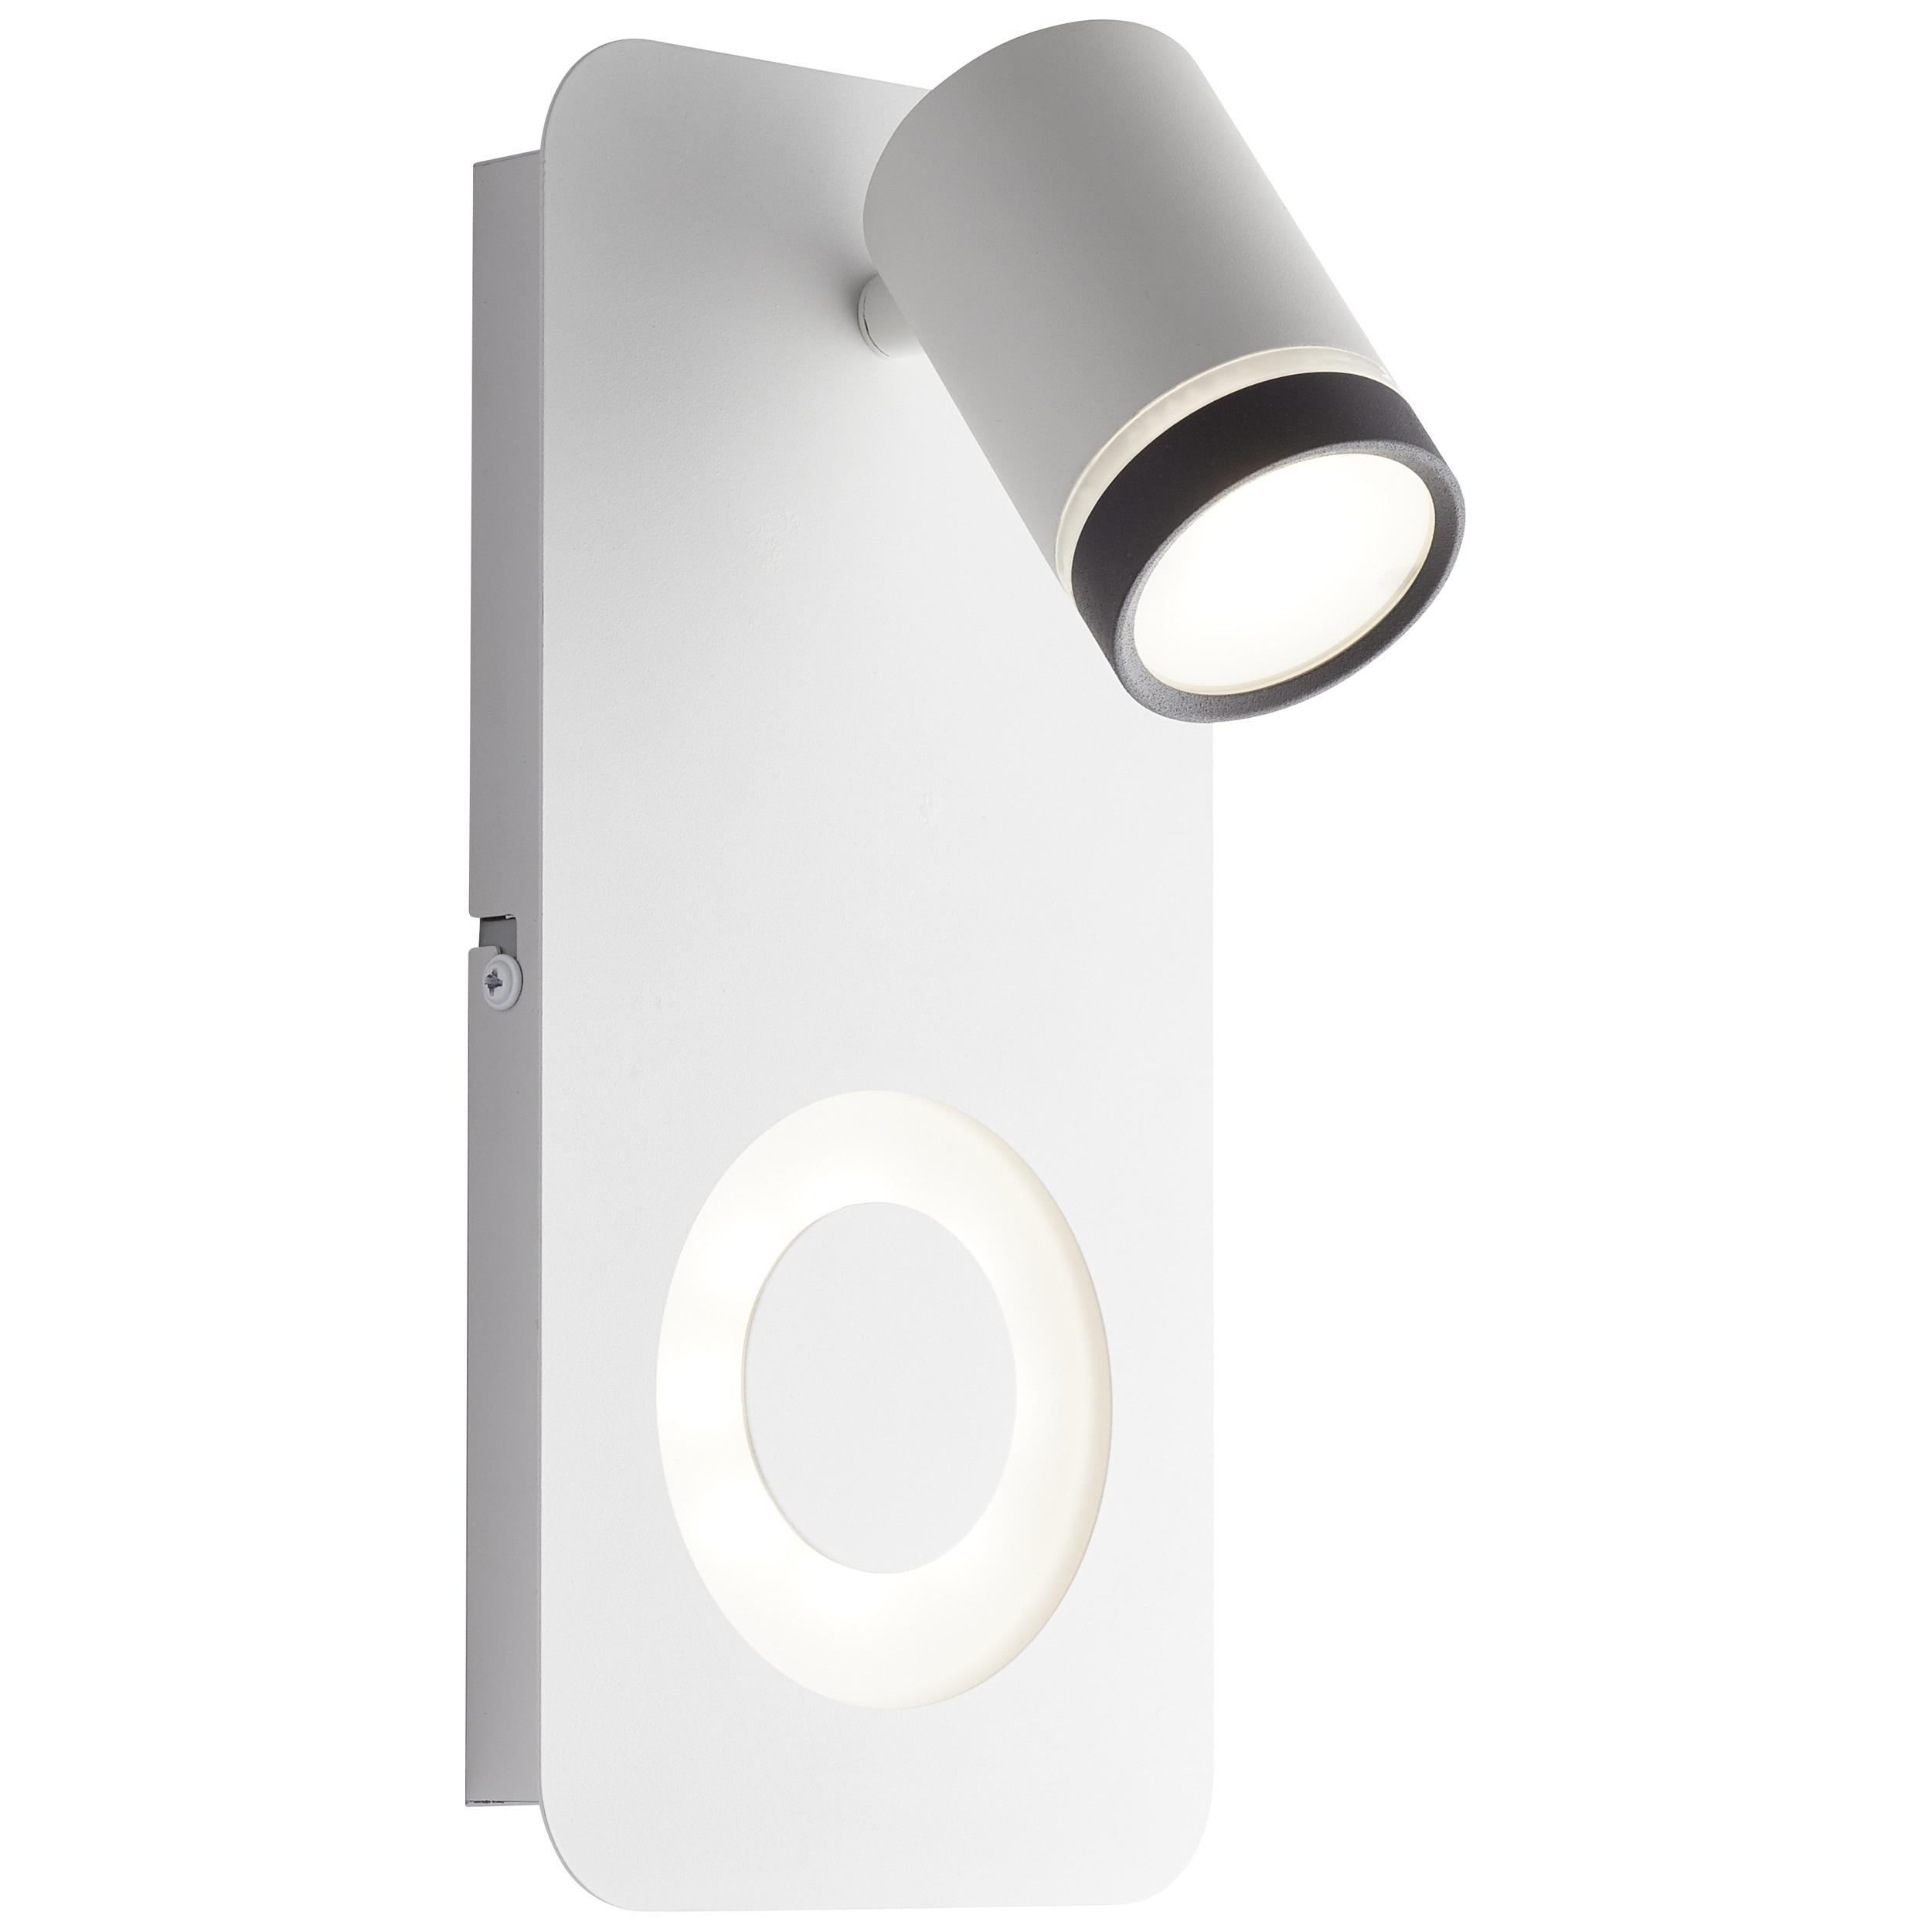 AEG Breena LED Wandspot 2flg sand weiß/schwarz